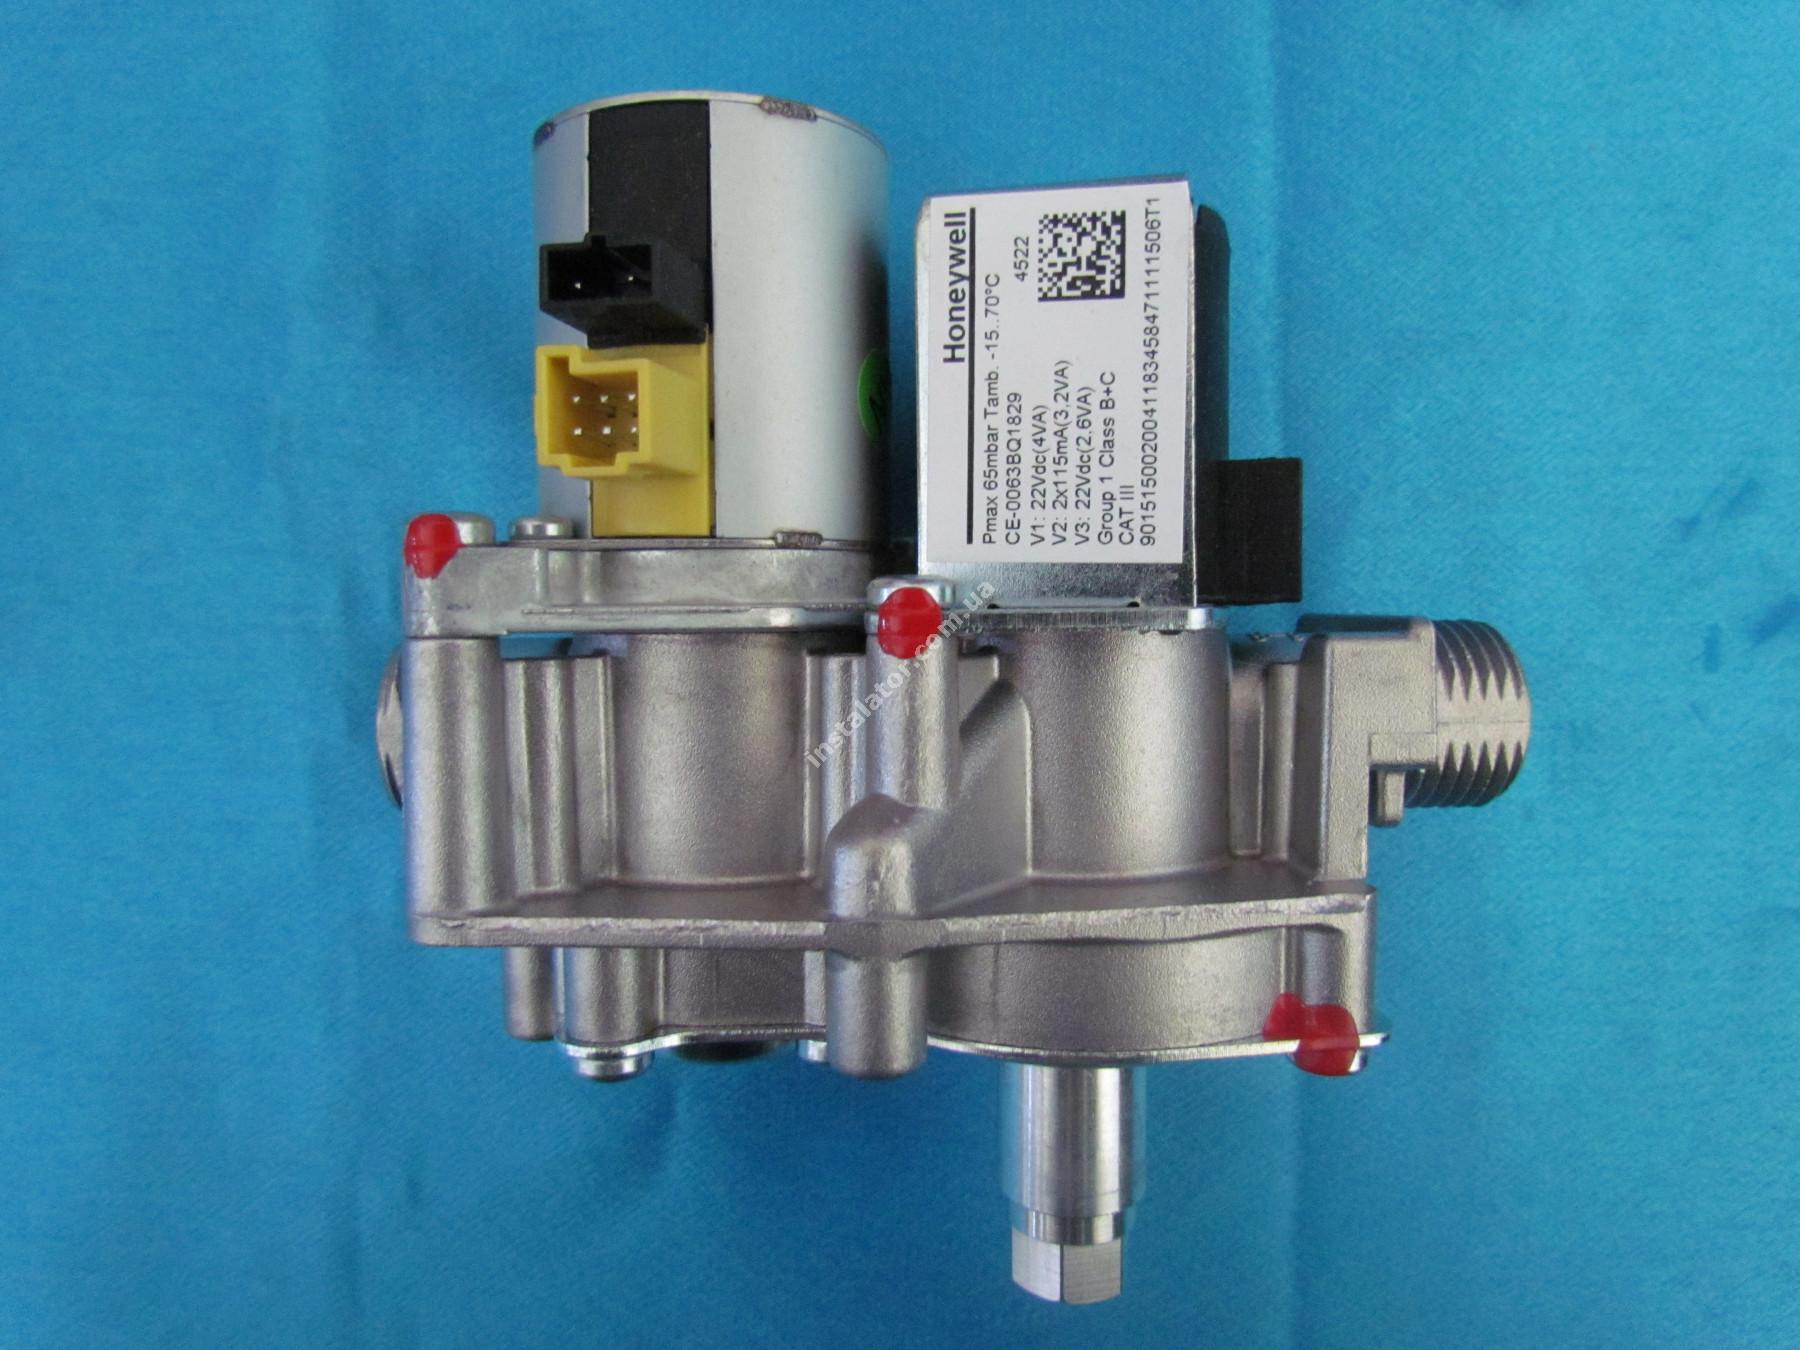 0020053968/0020049296 Газовий клапан з регулятором PROTHERM/VAILLANT full-image-3